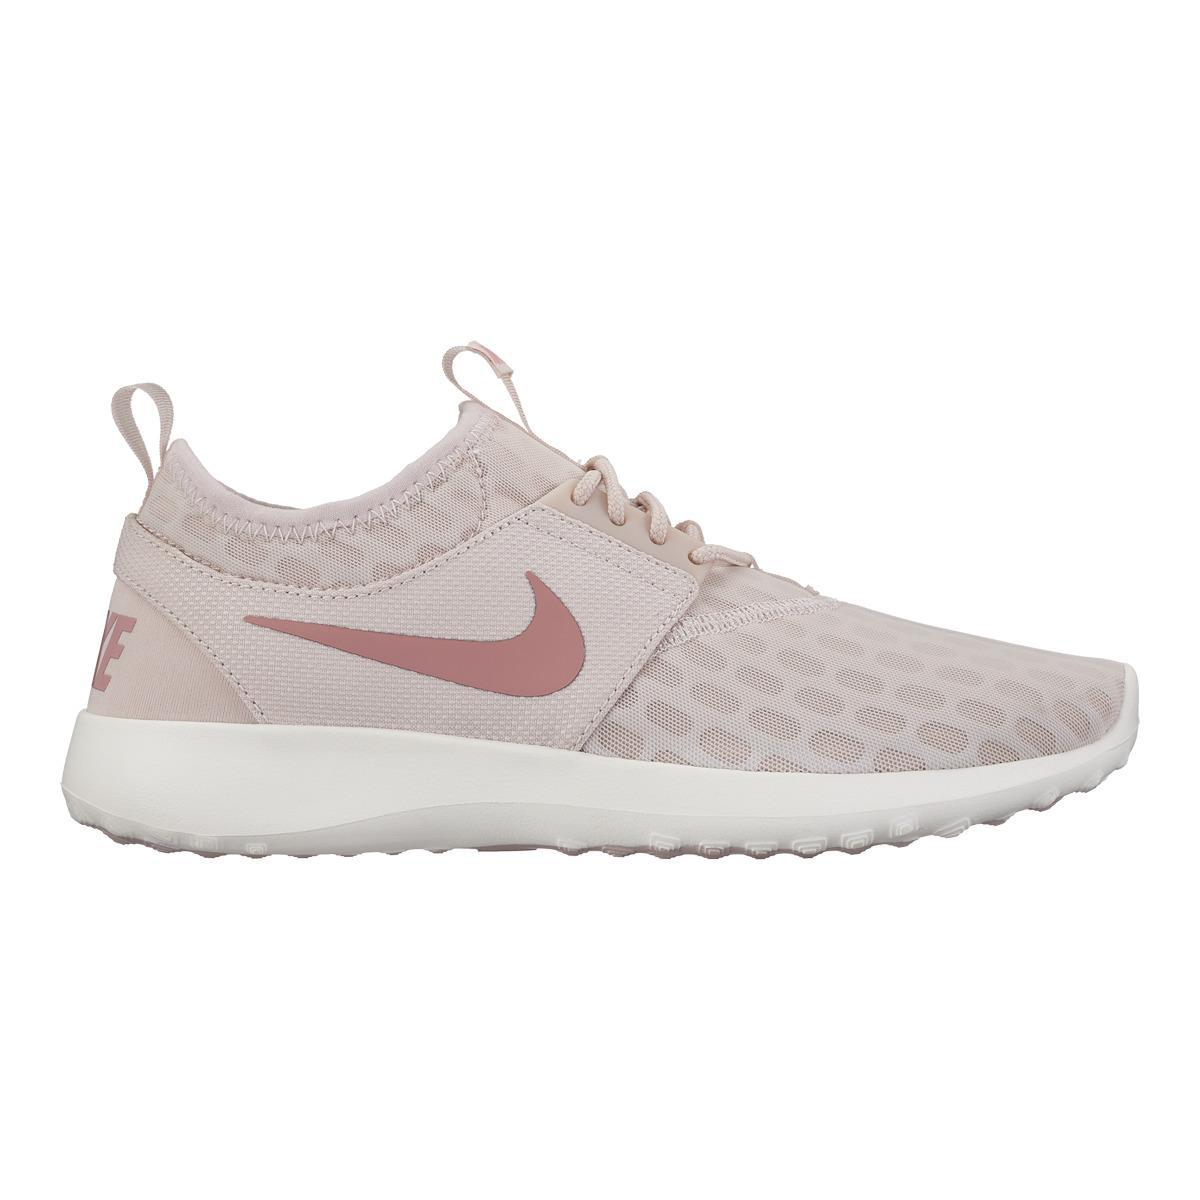 best website 03b15 a0d5a Lyst - Nike Juvenate Casualwear Trainers in Pink